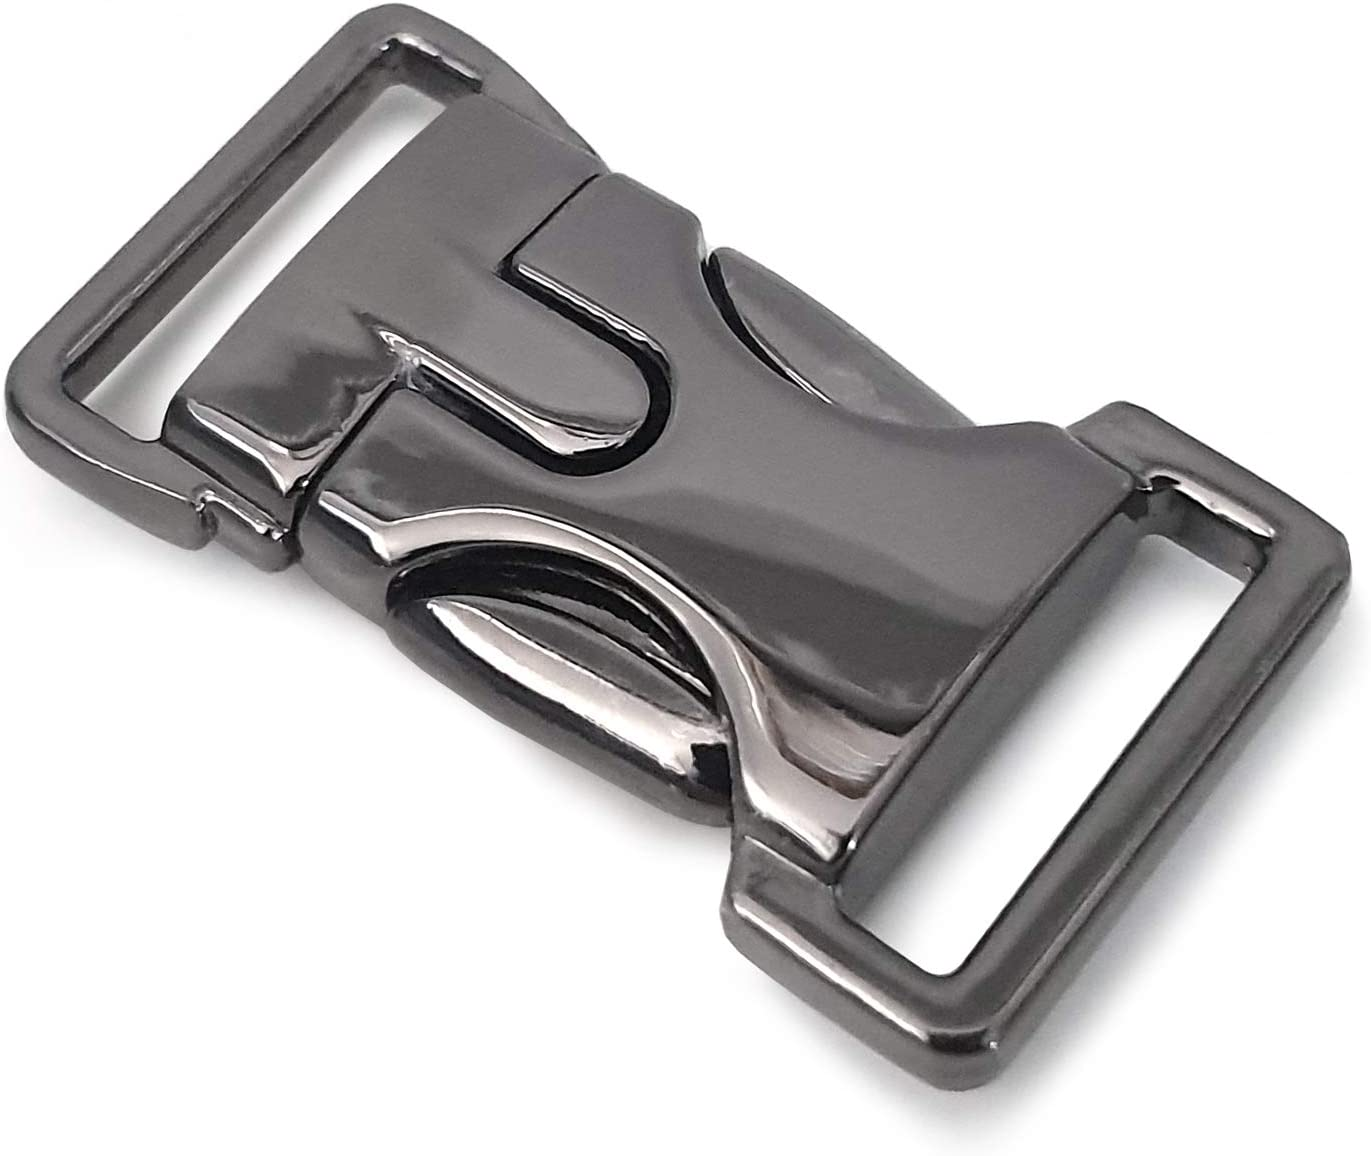 Rucksack 5//8 // Klippverschluss//Steckschlie/ßer//Steckverschluss f/ür Paracord-Armb/änder Farbe: Titan 2er Set Hundehalsb/änder Ganzoo Metall-Klickverschluss mit Feder-Verschluss